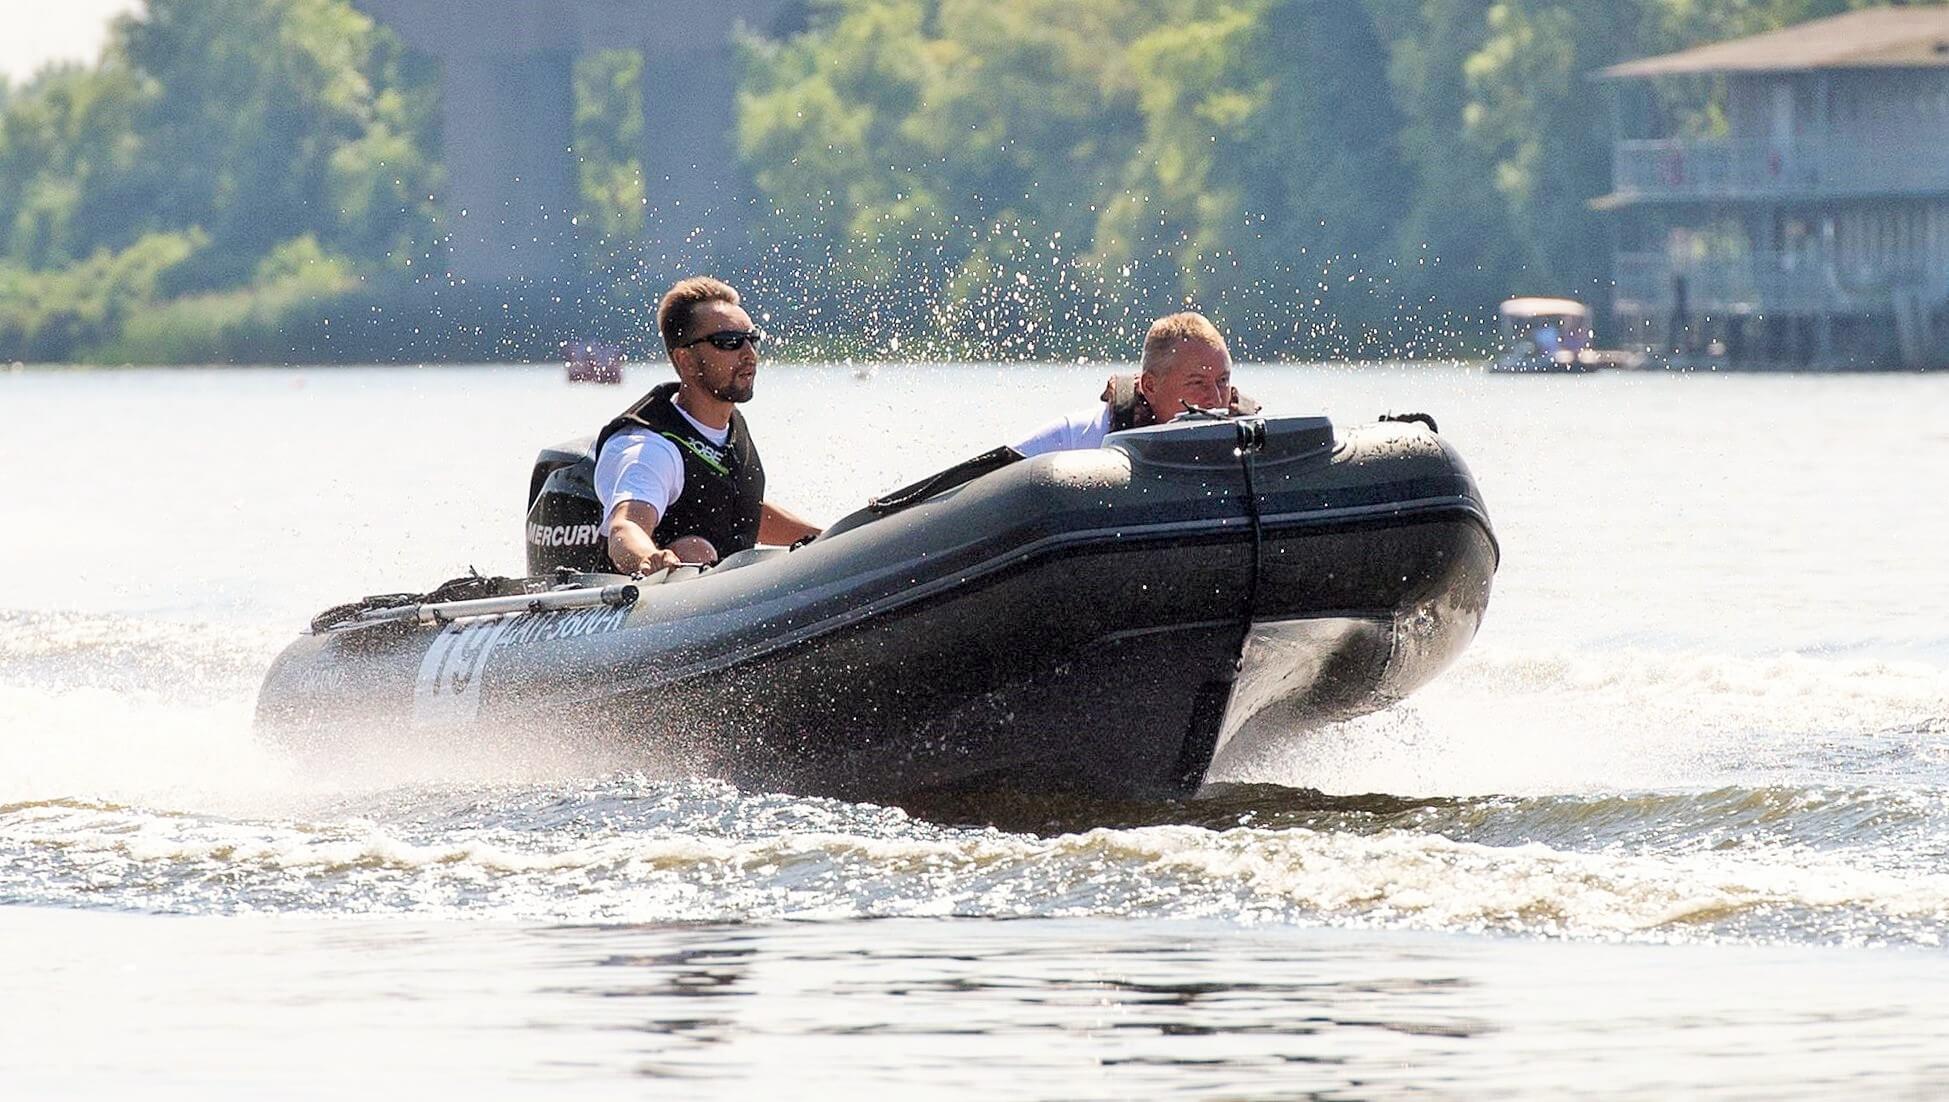 Надувная лодка с жестким дном GRAND Silver Line S420N, Надувная лодка GRAND Silver Line S420N, GRAND Silver Line S420NF, GRAND Silver Line S420N, GRAND S420NF, GRAND S420N, GRAND S420, Надувная лодка GRAND, Надувная лодка ГРАНД, Надувная лодка с жестким дном, RIB, Rigid Inflatable Boats